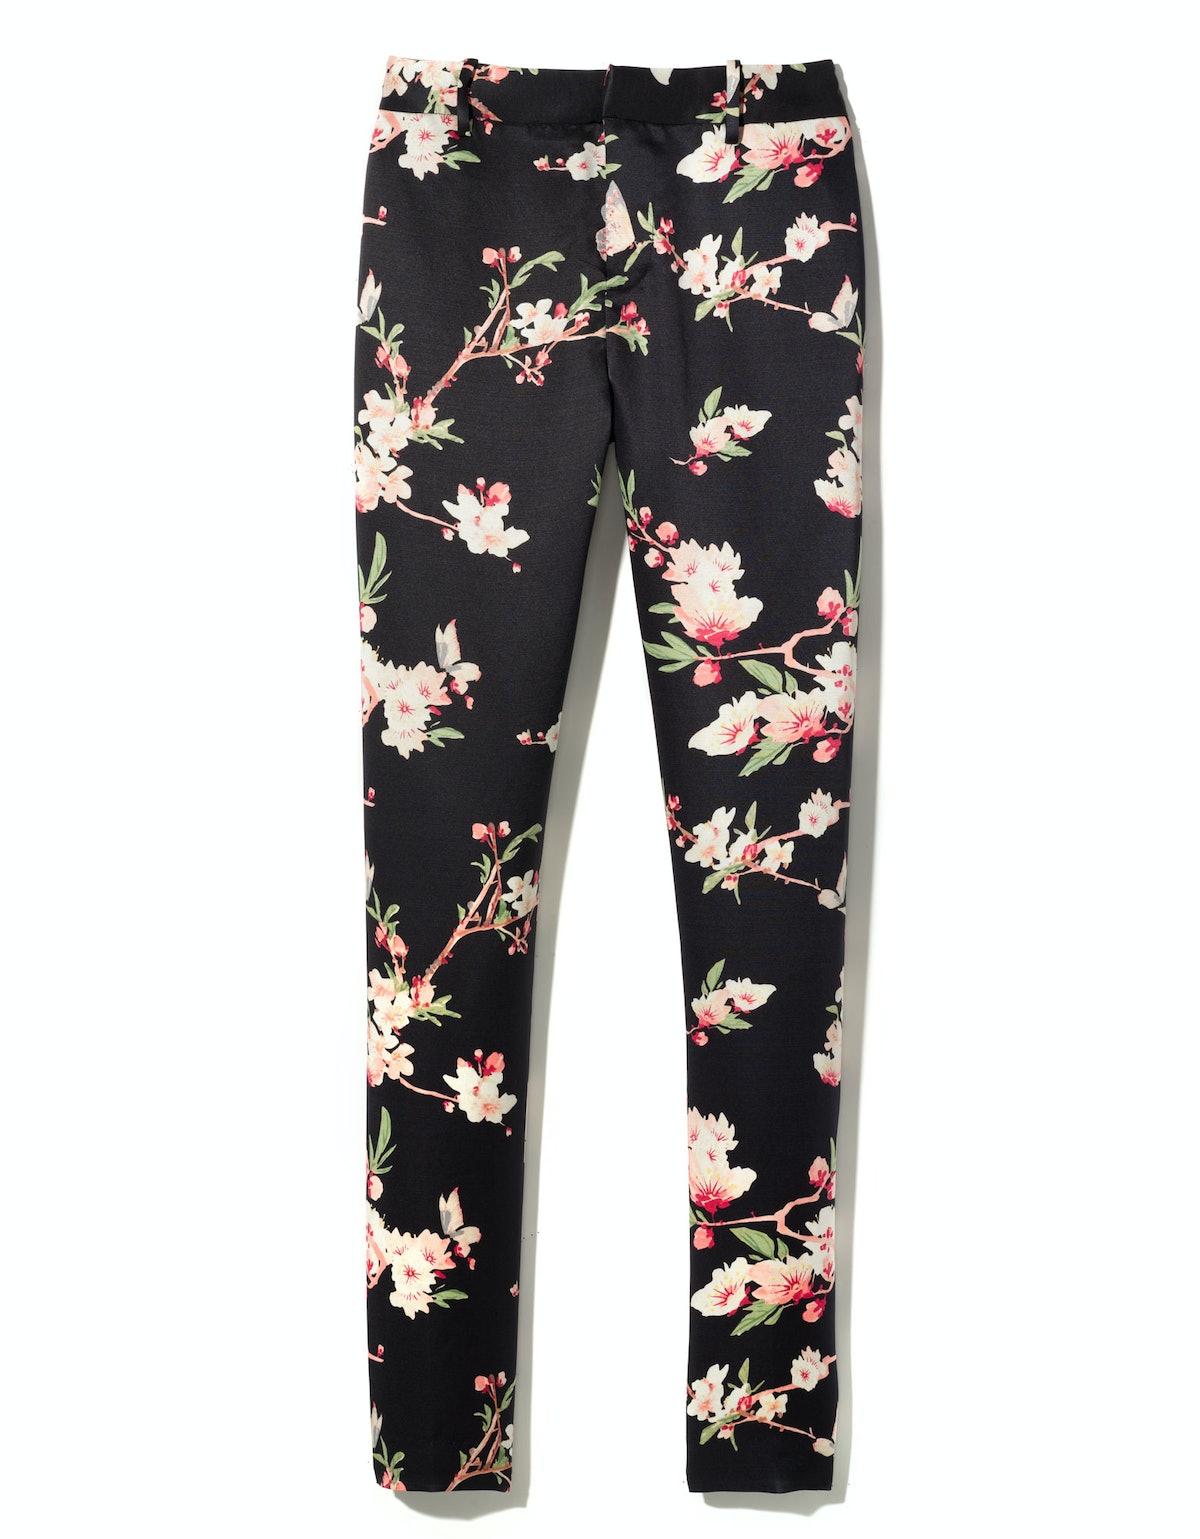 Joie pants, $348, [joie.com](http://rstyle.me/n/duc4p3w3n).